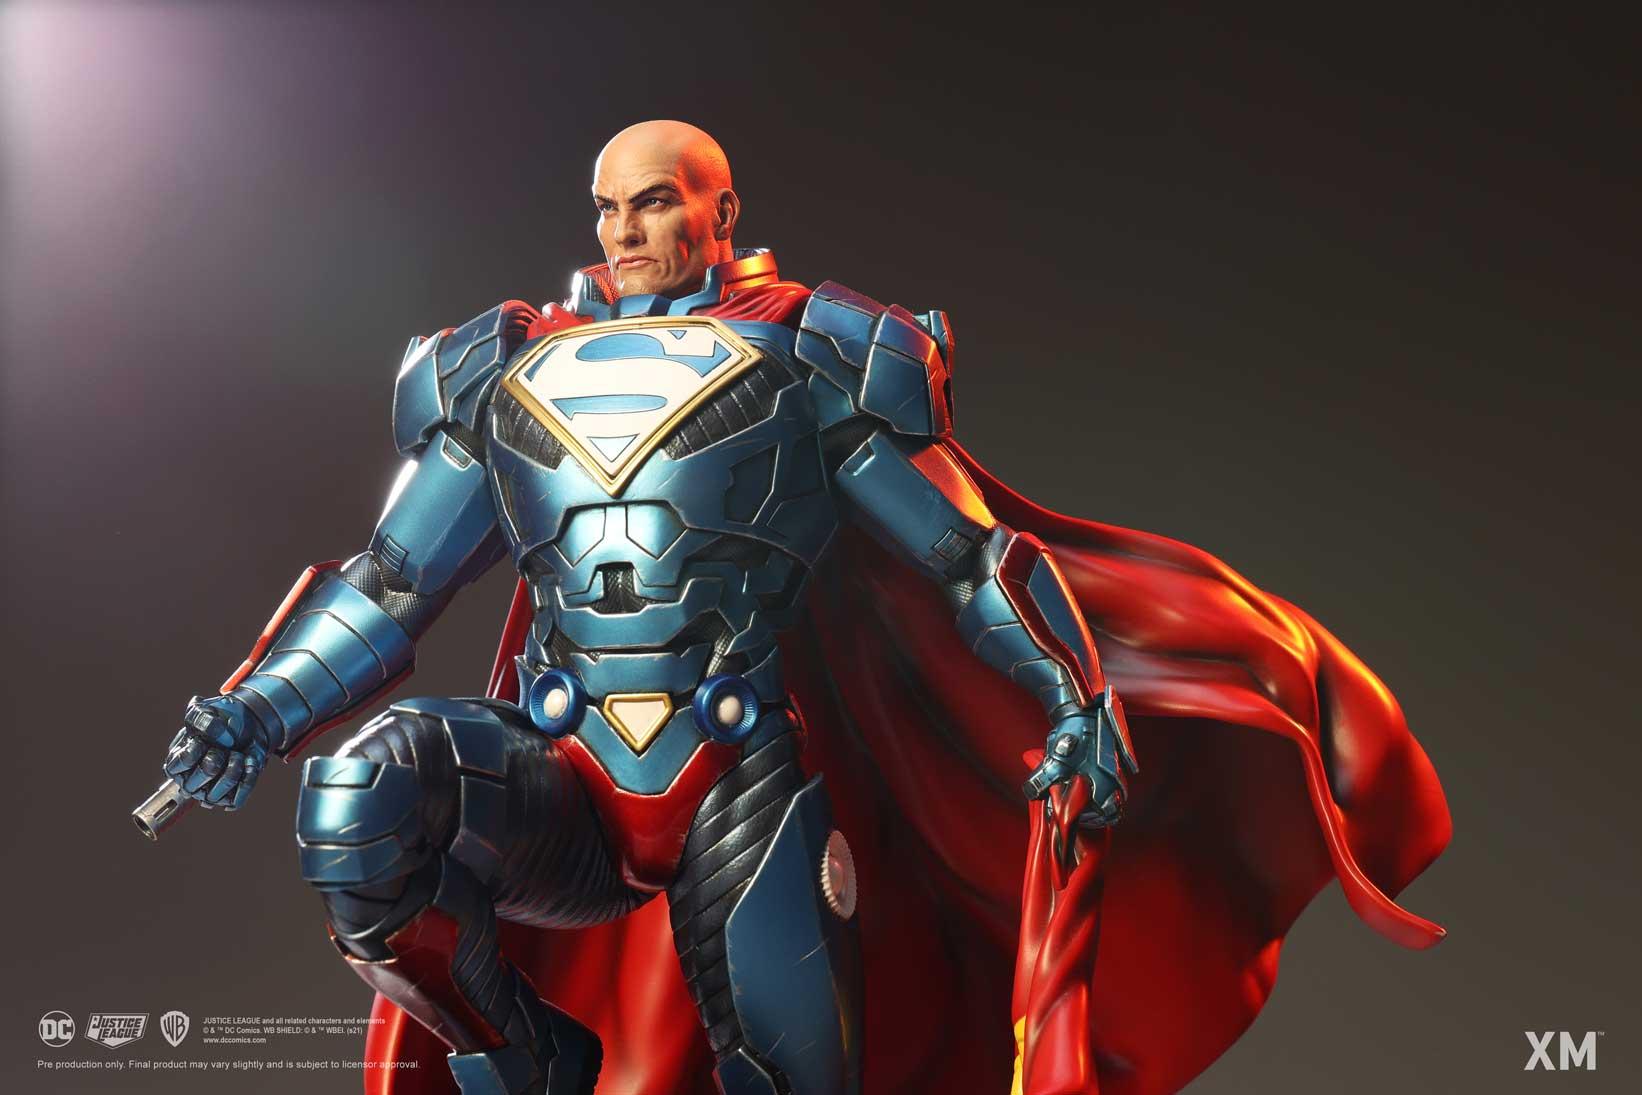 Link a Xm Studios_Lex_Luthor_Superman_DC- (3)